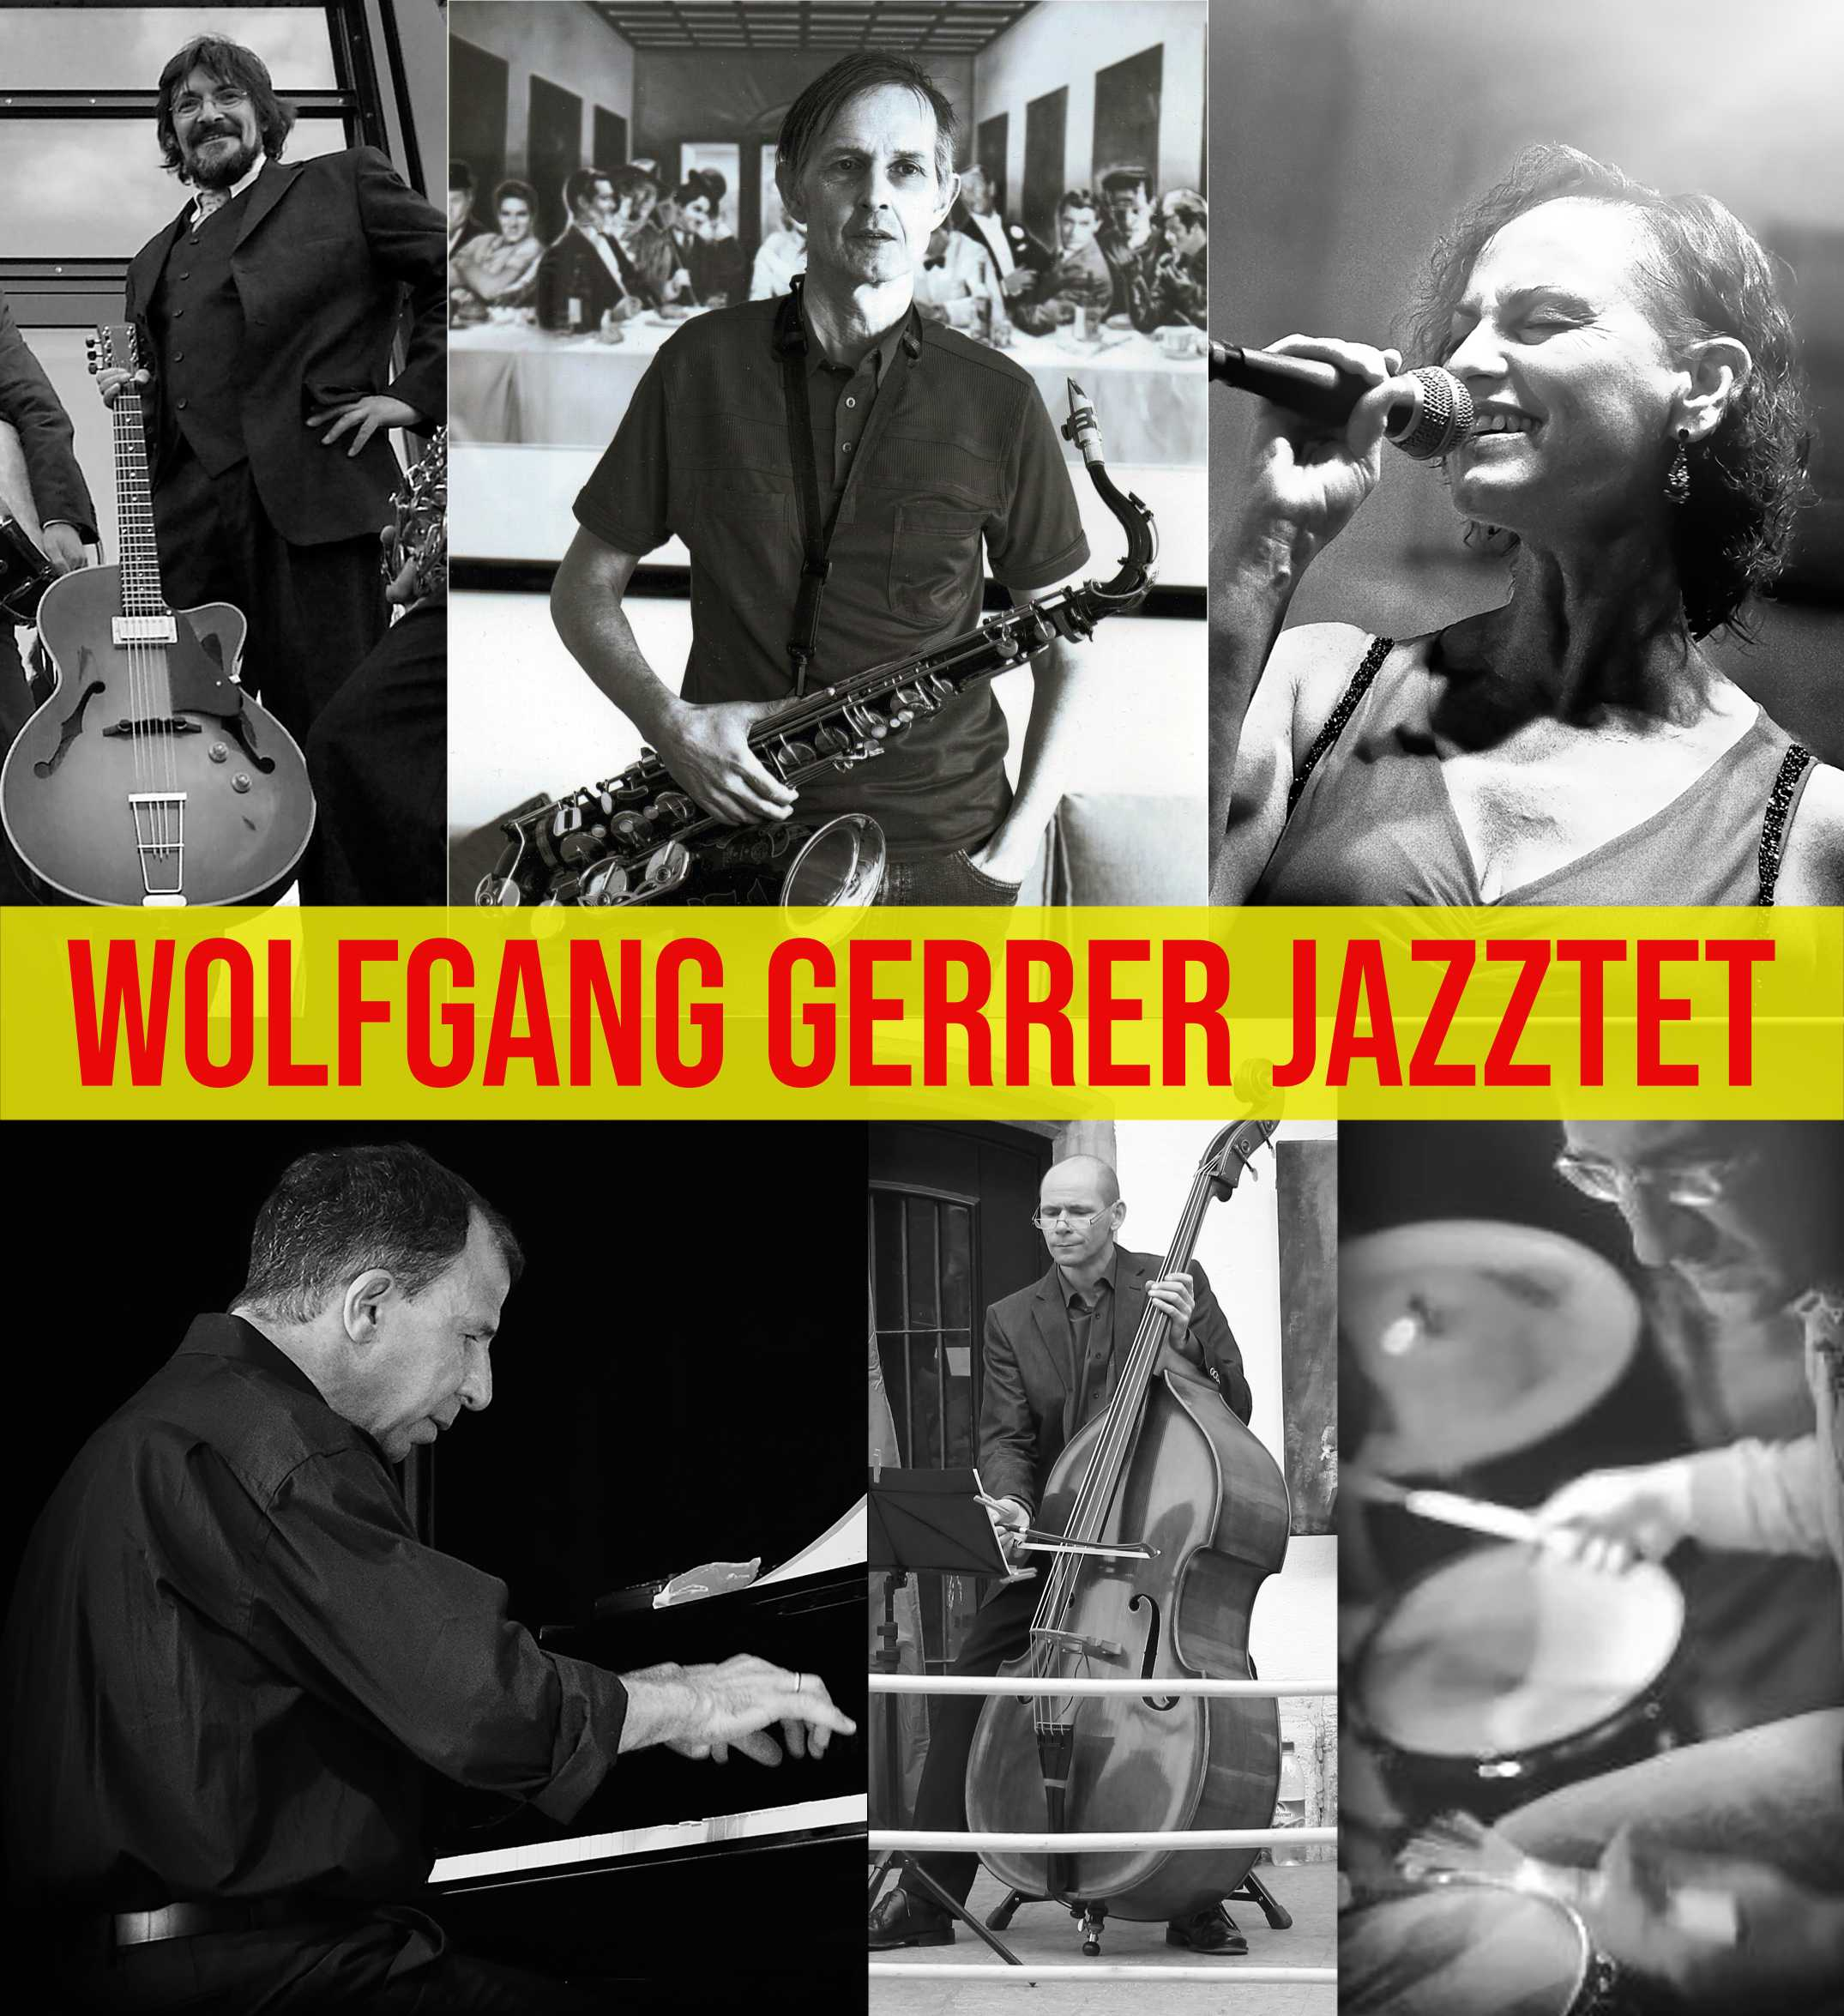 Wolfgang Gerrer Jazztet